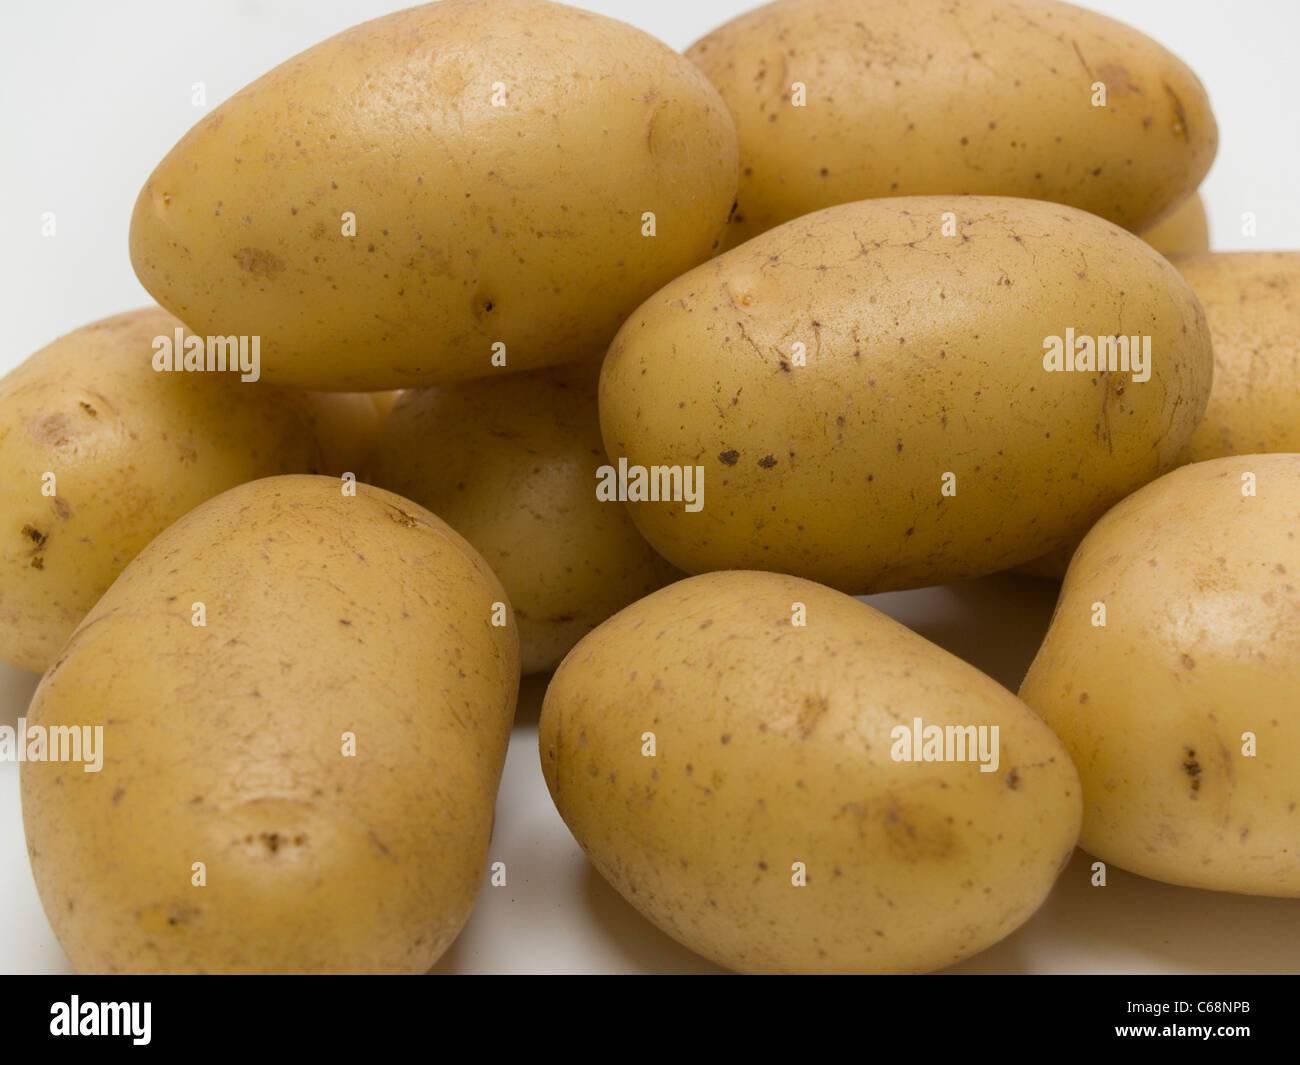 many potatoes - Stock Image